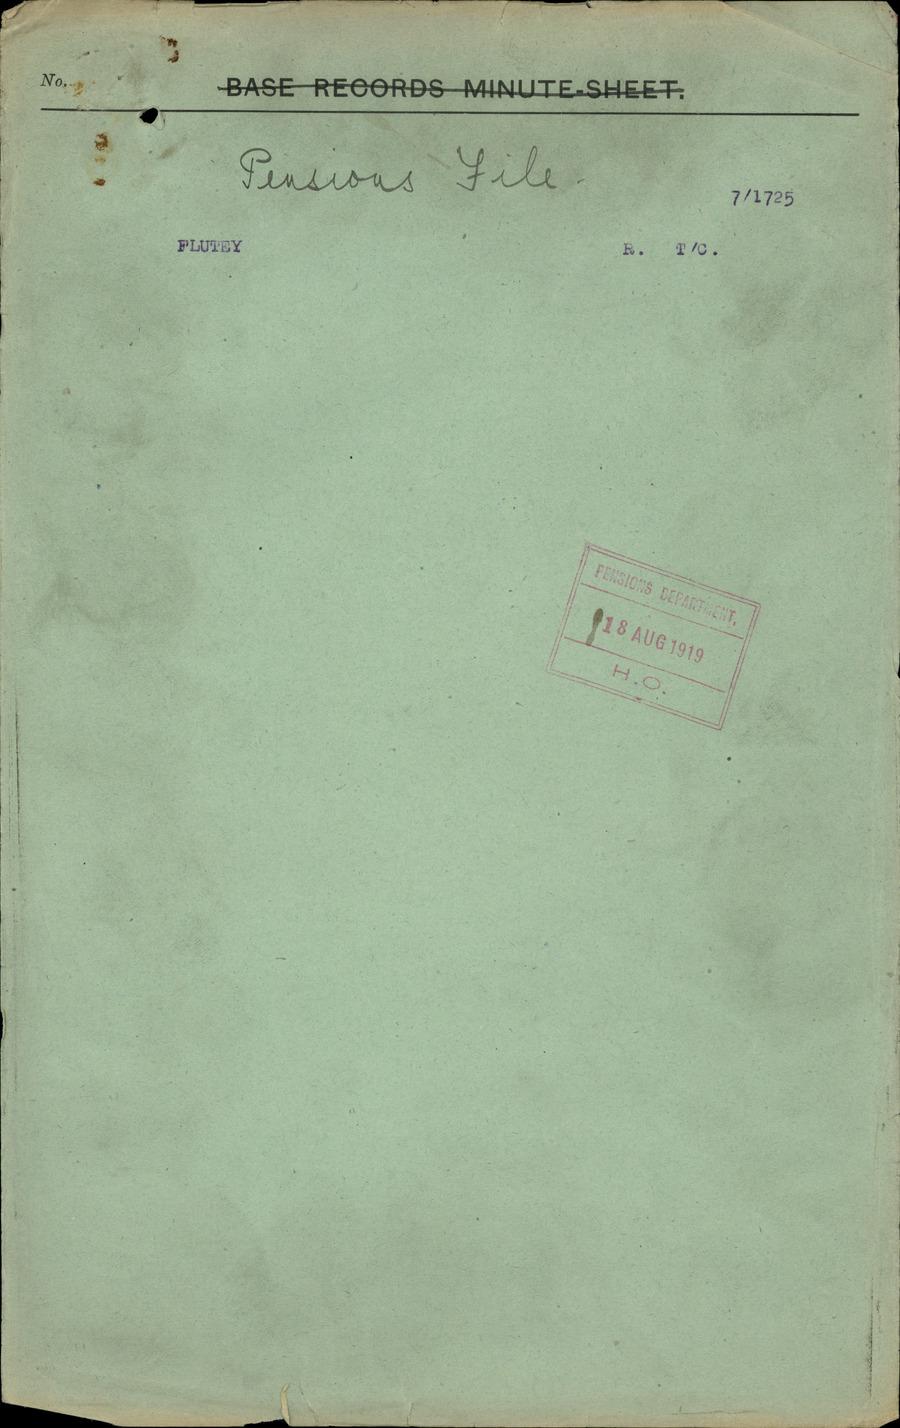 FLUTEY, Robert - WW1 7/1725 - DPF [Duplicate Personnel File]